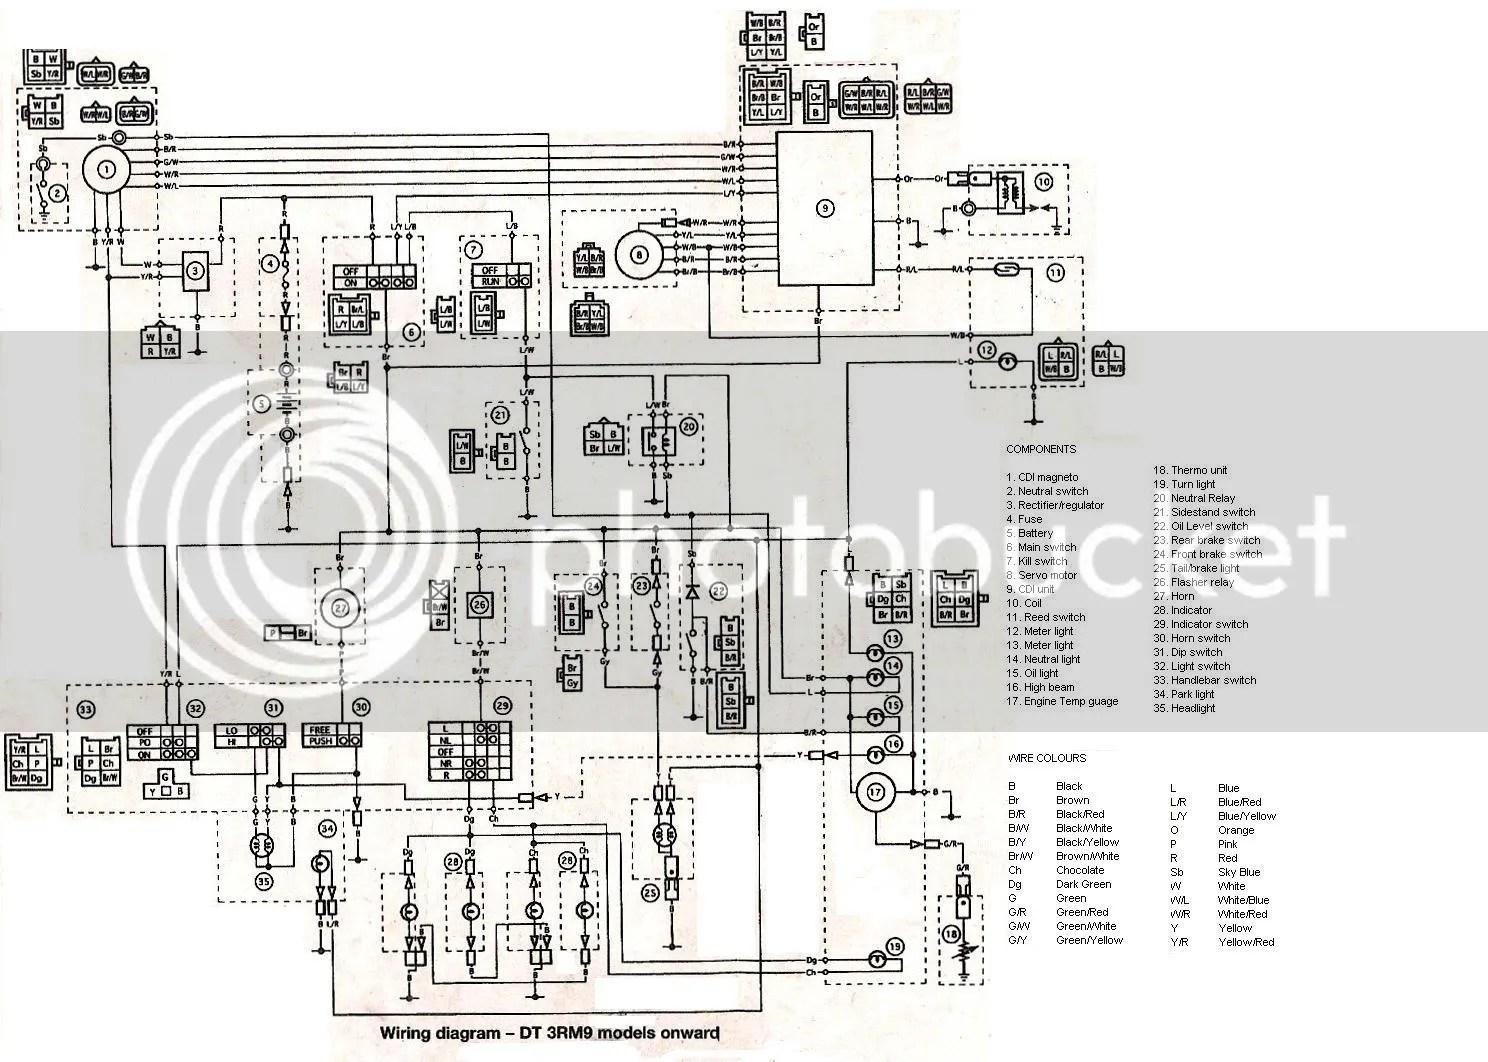 handlebar wiring diagrams general wiring diagram view handlebar wiring diagrams general [ 1488 x 1062 Pixel ]